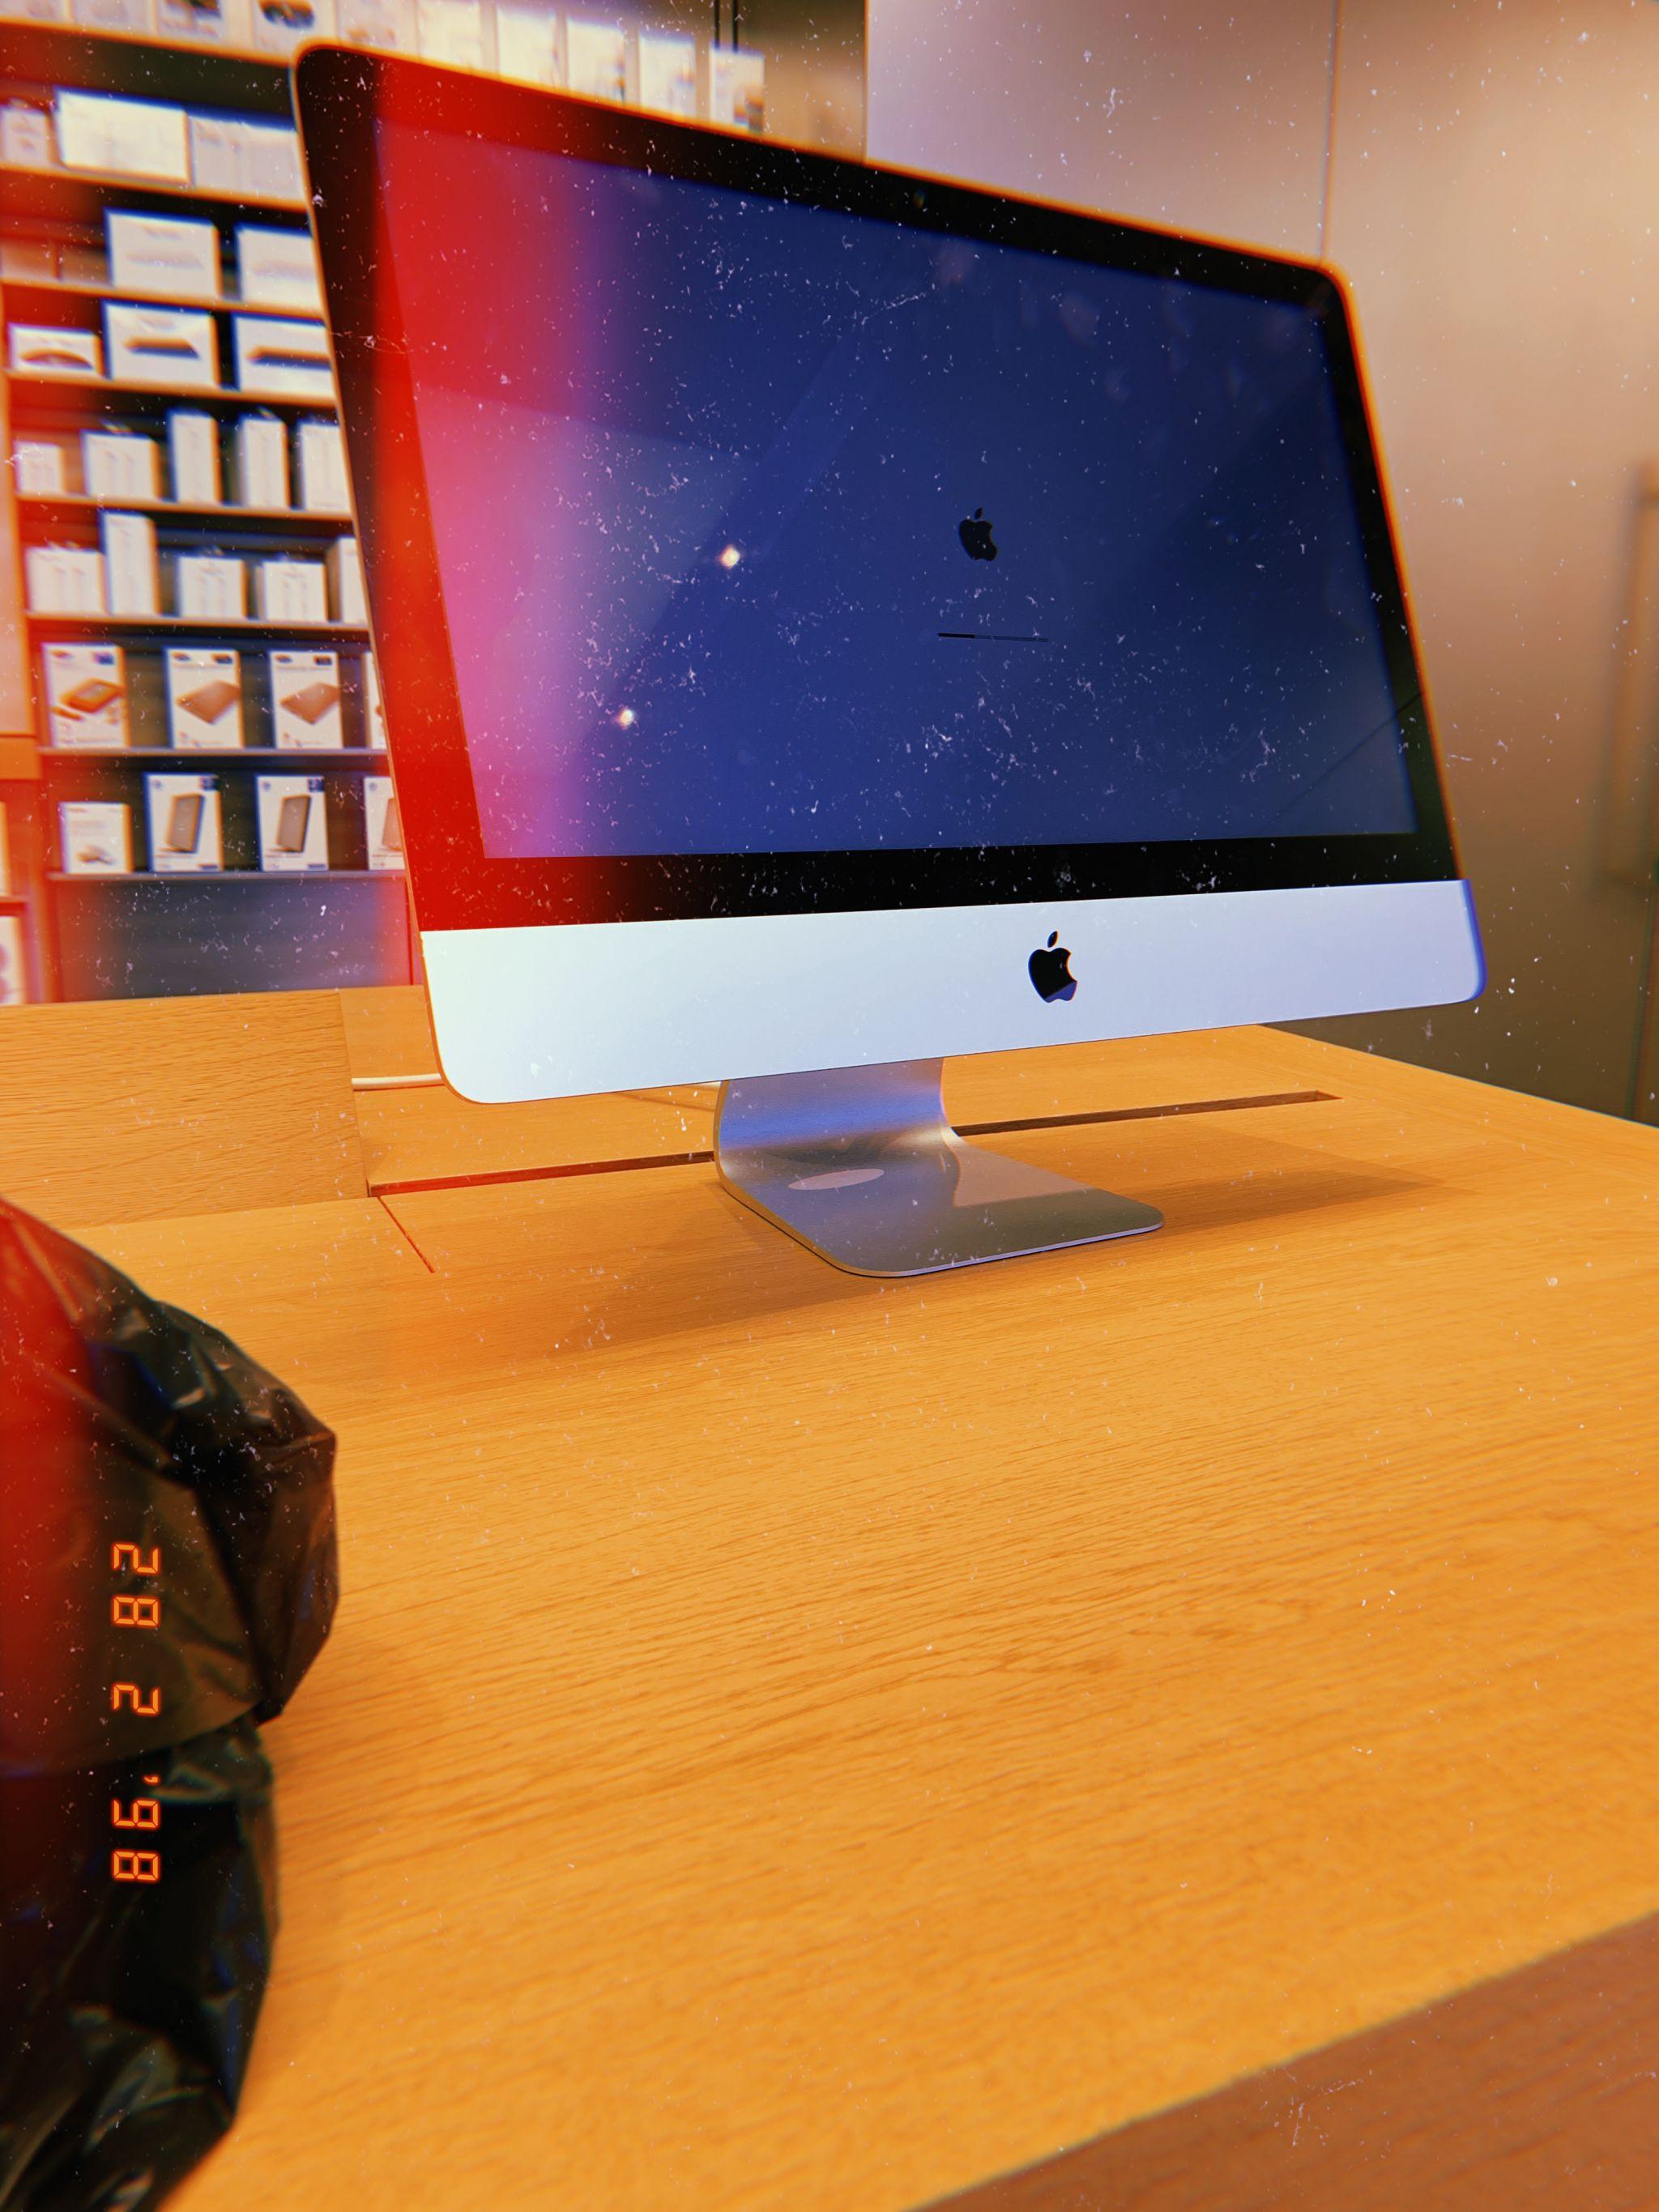 Manchester Arndale, iMac, Broken, Apple Store, Manchester, Shopping Centre, katiebwrites,